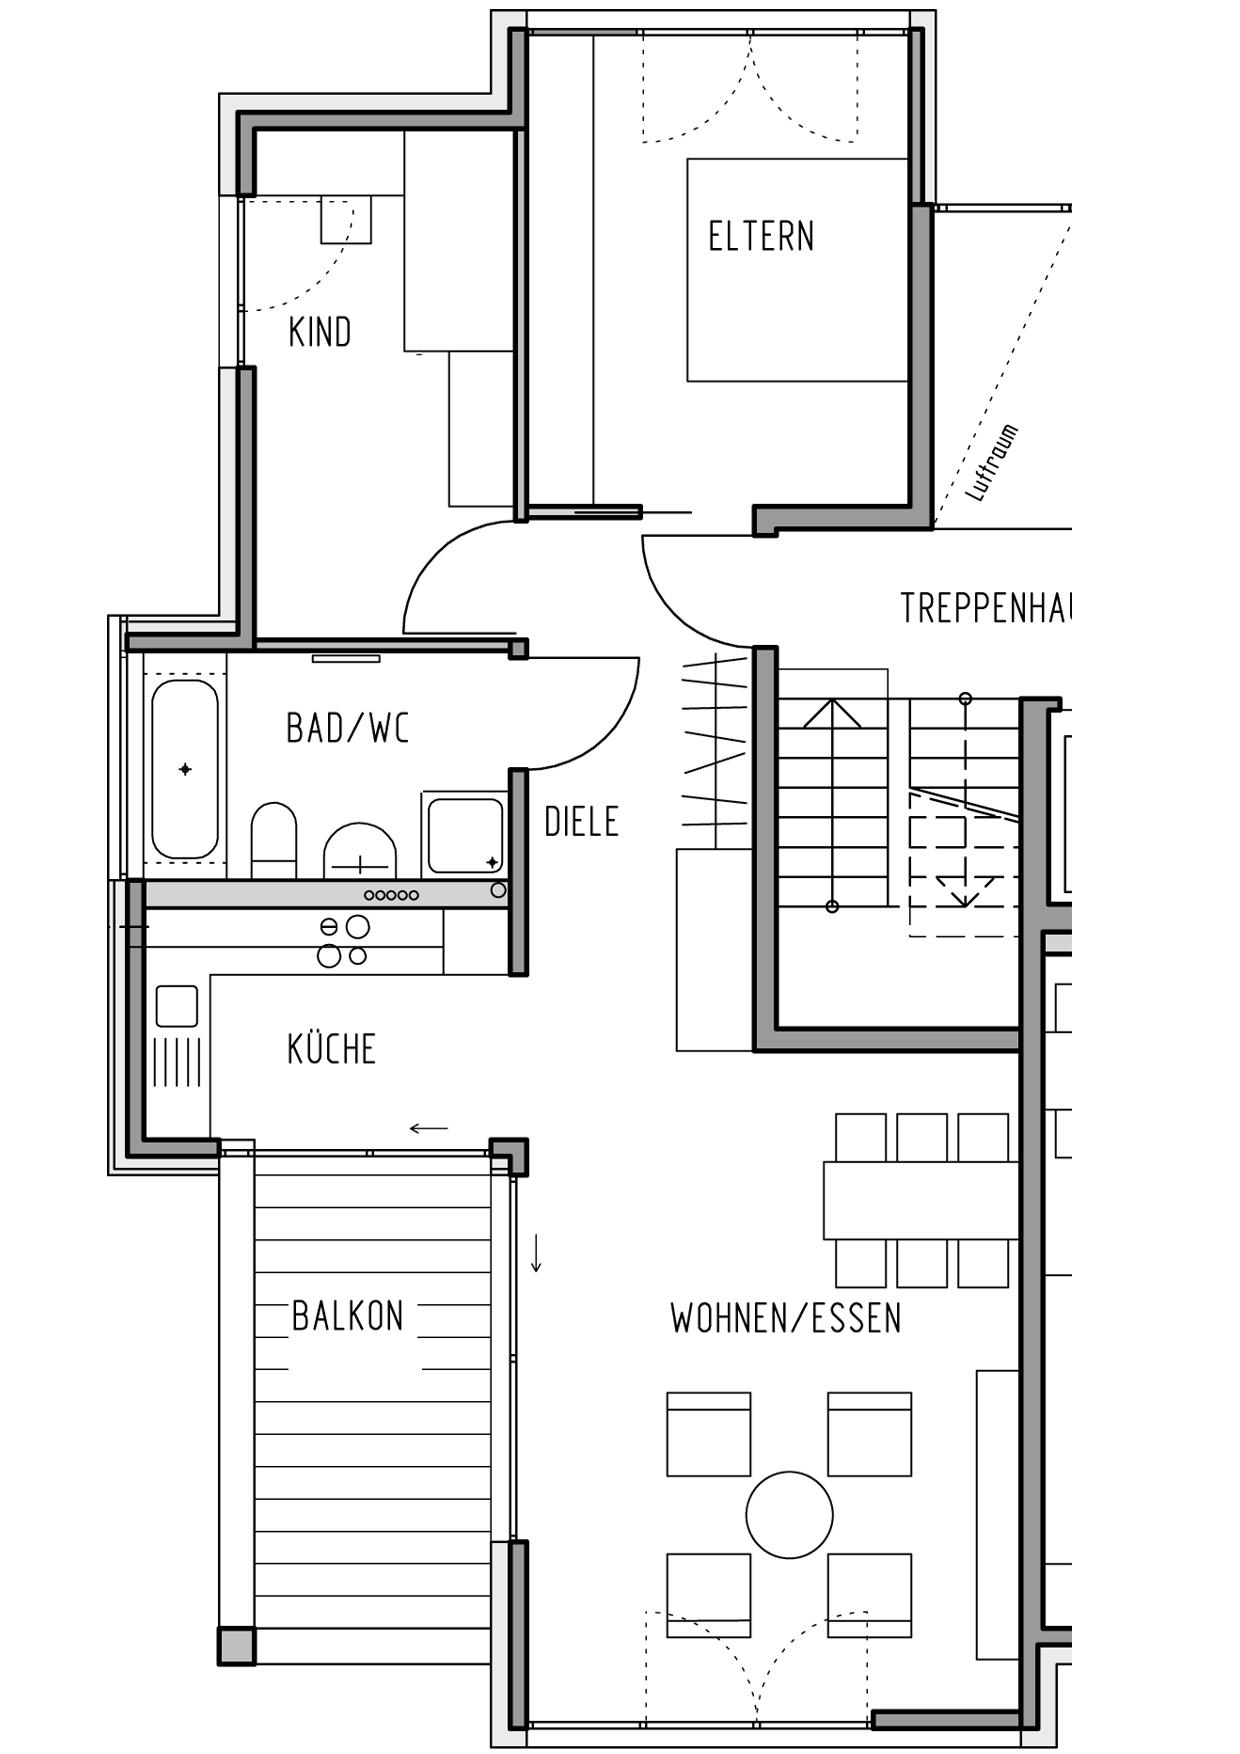 k che essen wohnen grundriss wasserhahn k che umklappbar buffetschrank weiss spritzschutz. Black Bedroom Furniture Sets. Home Design Ideas